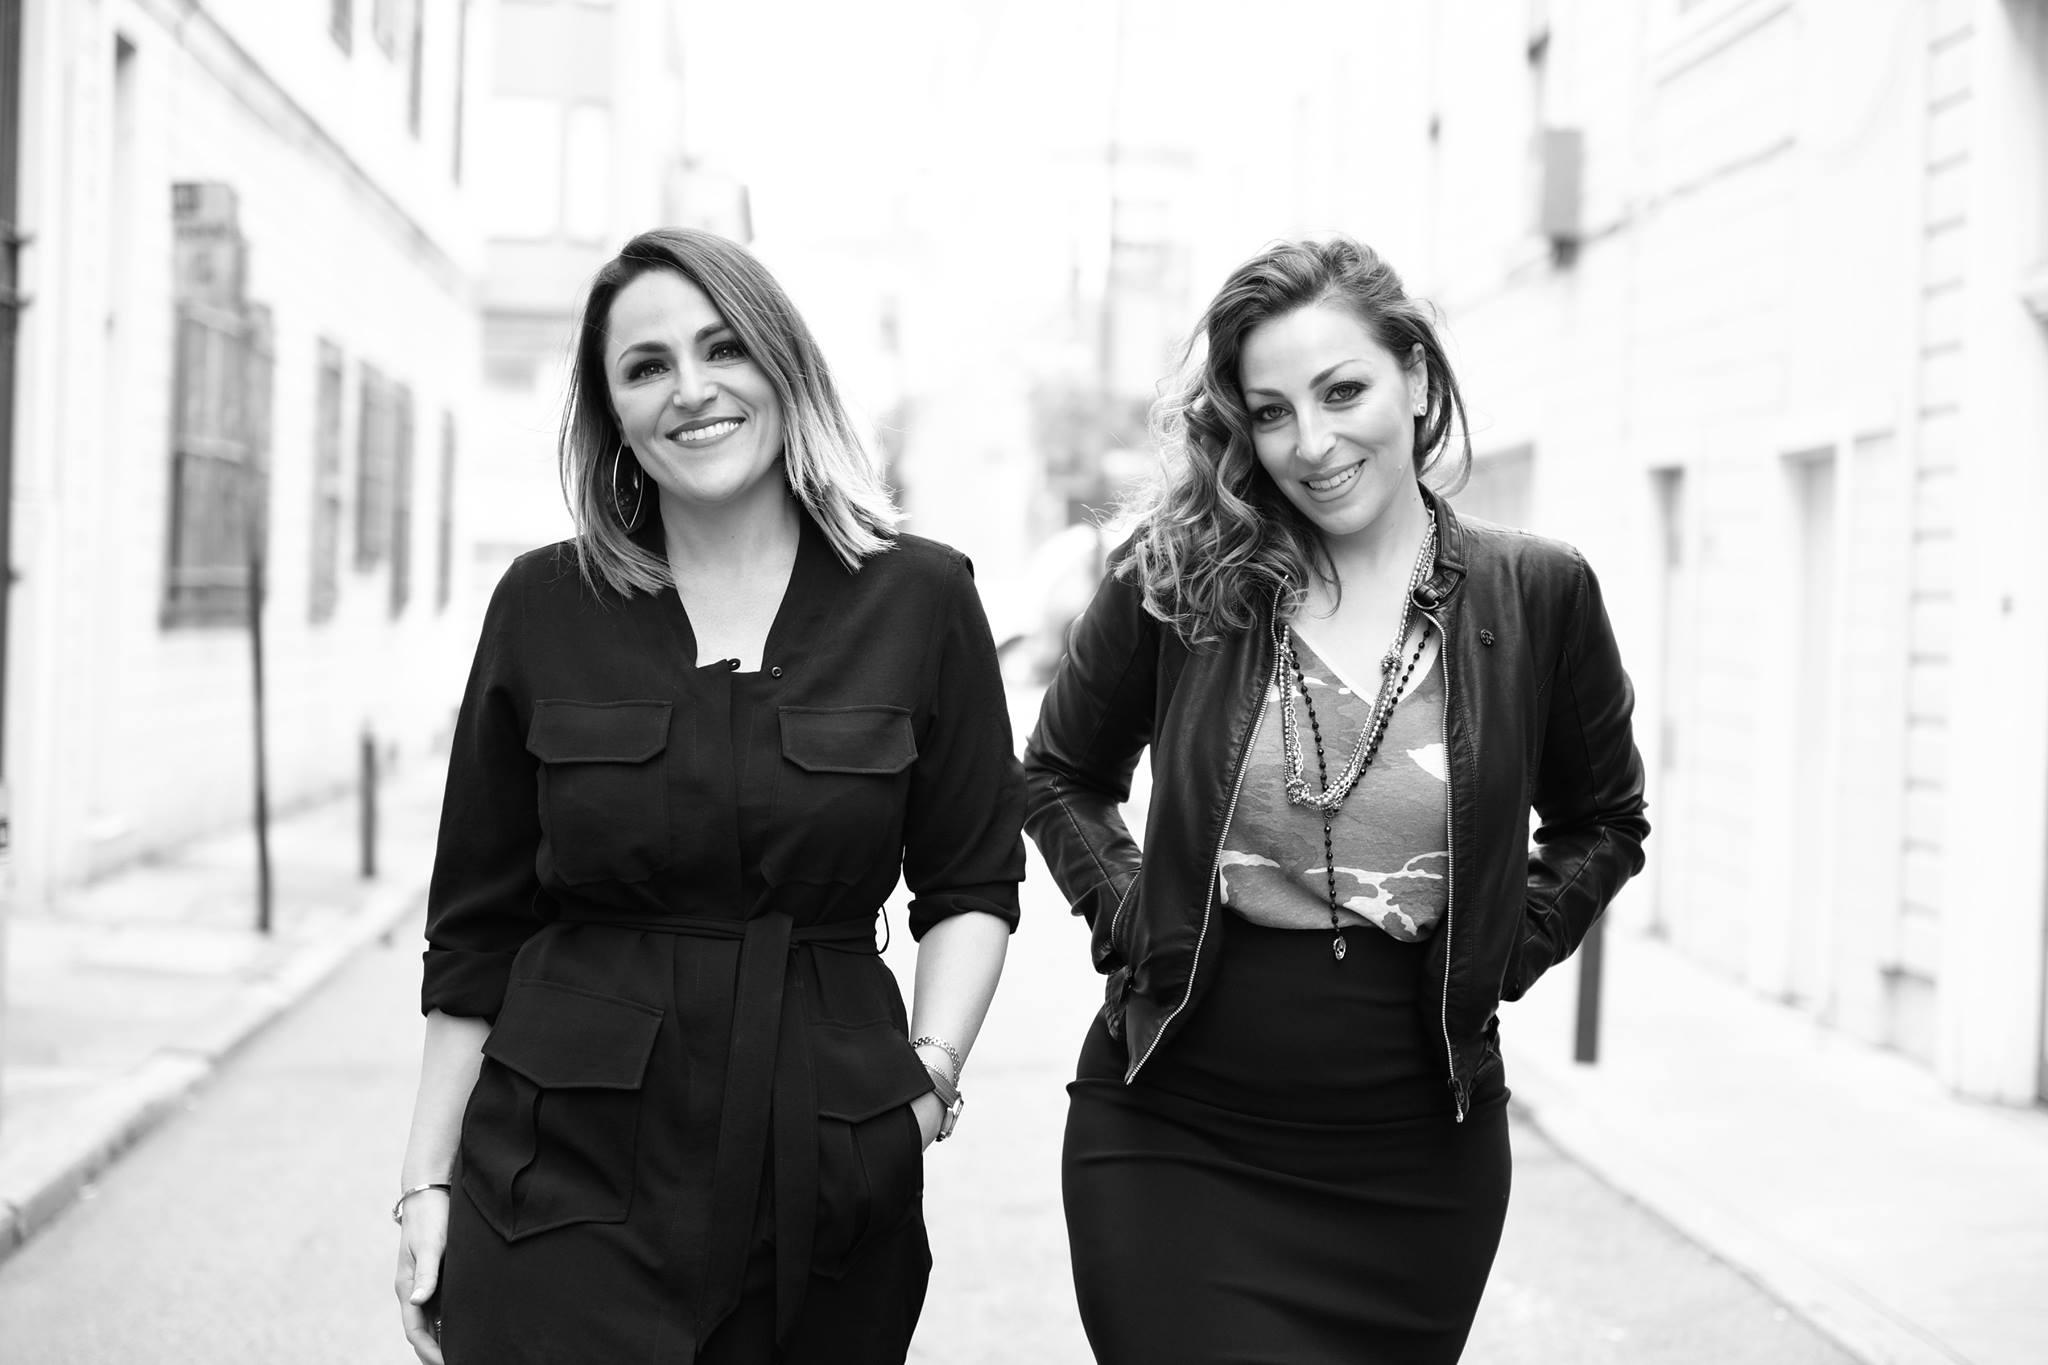 The dynamic sister-duo, photo via Facebook